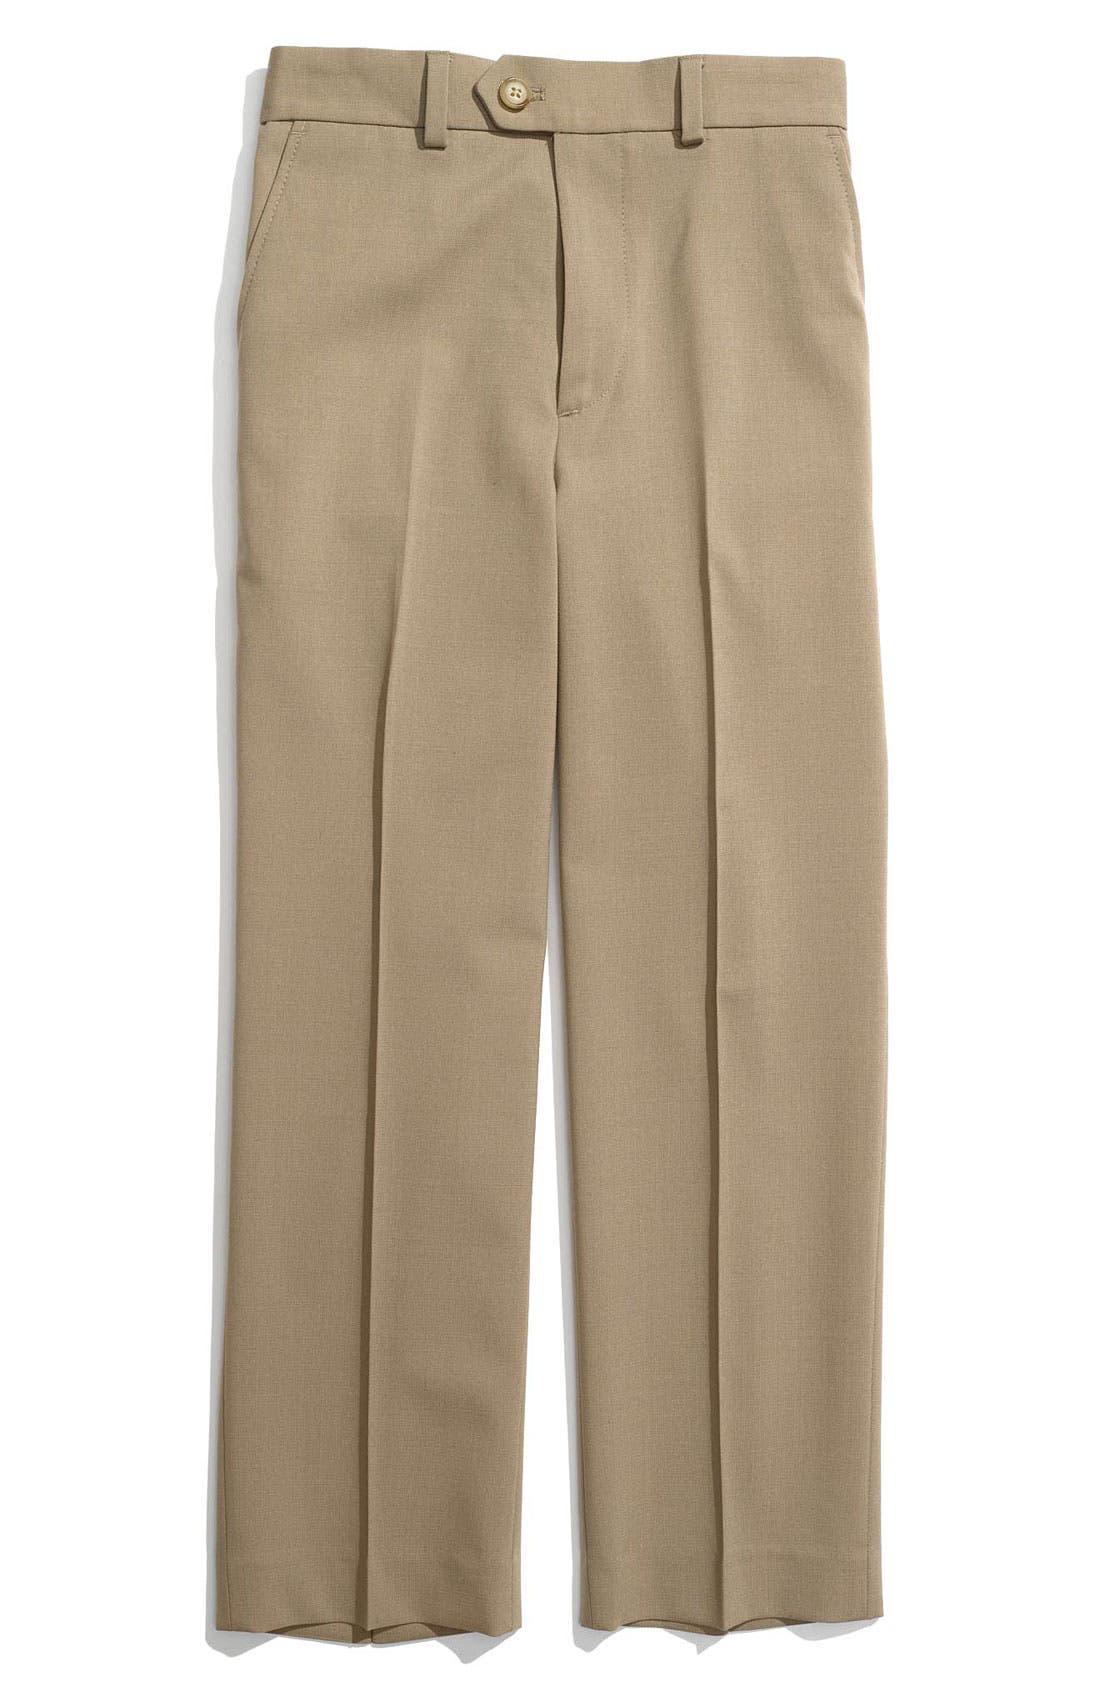 Alternate Image 1 Selected - Joseph Abboud Flat Front Dress Pants (Toddler)